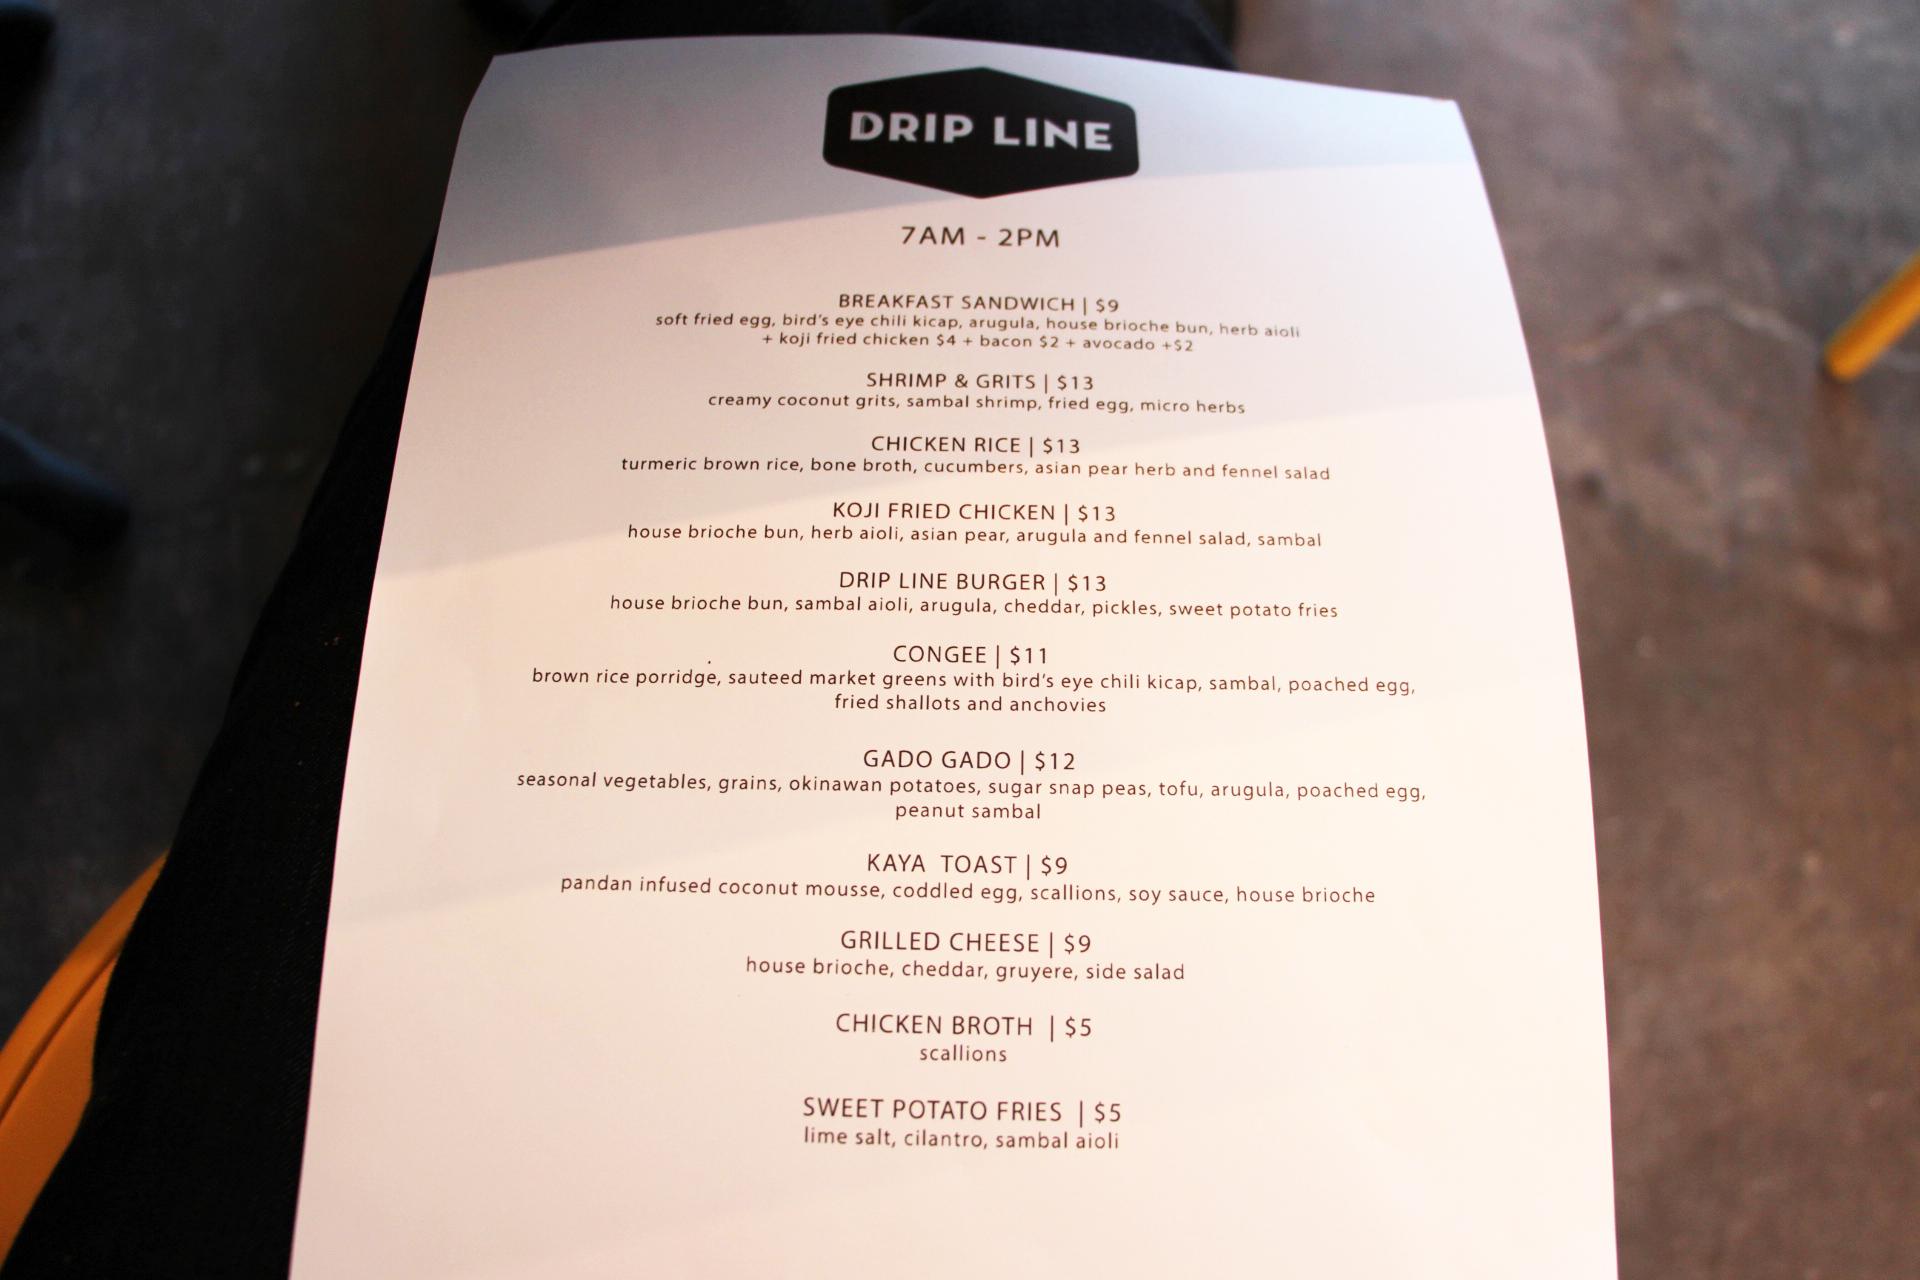 The Drip Line menu.